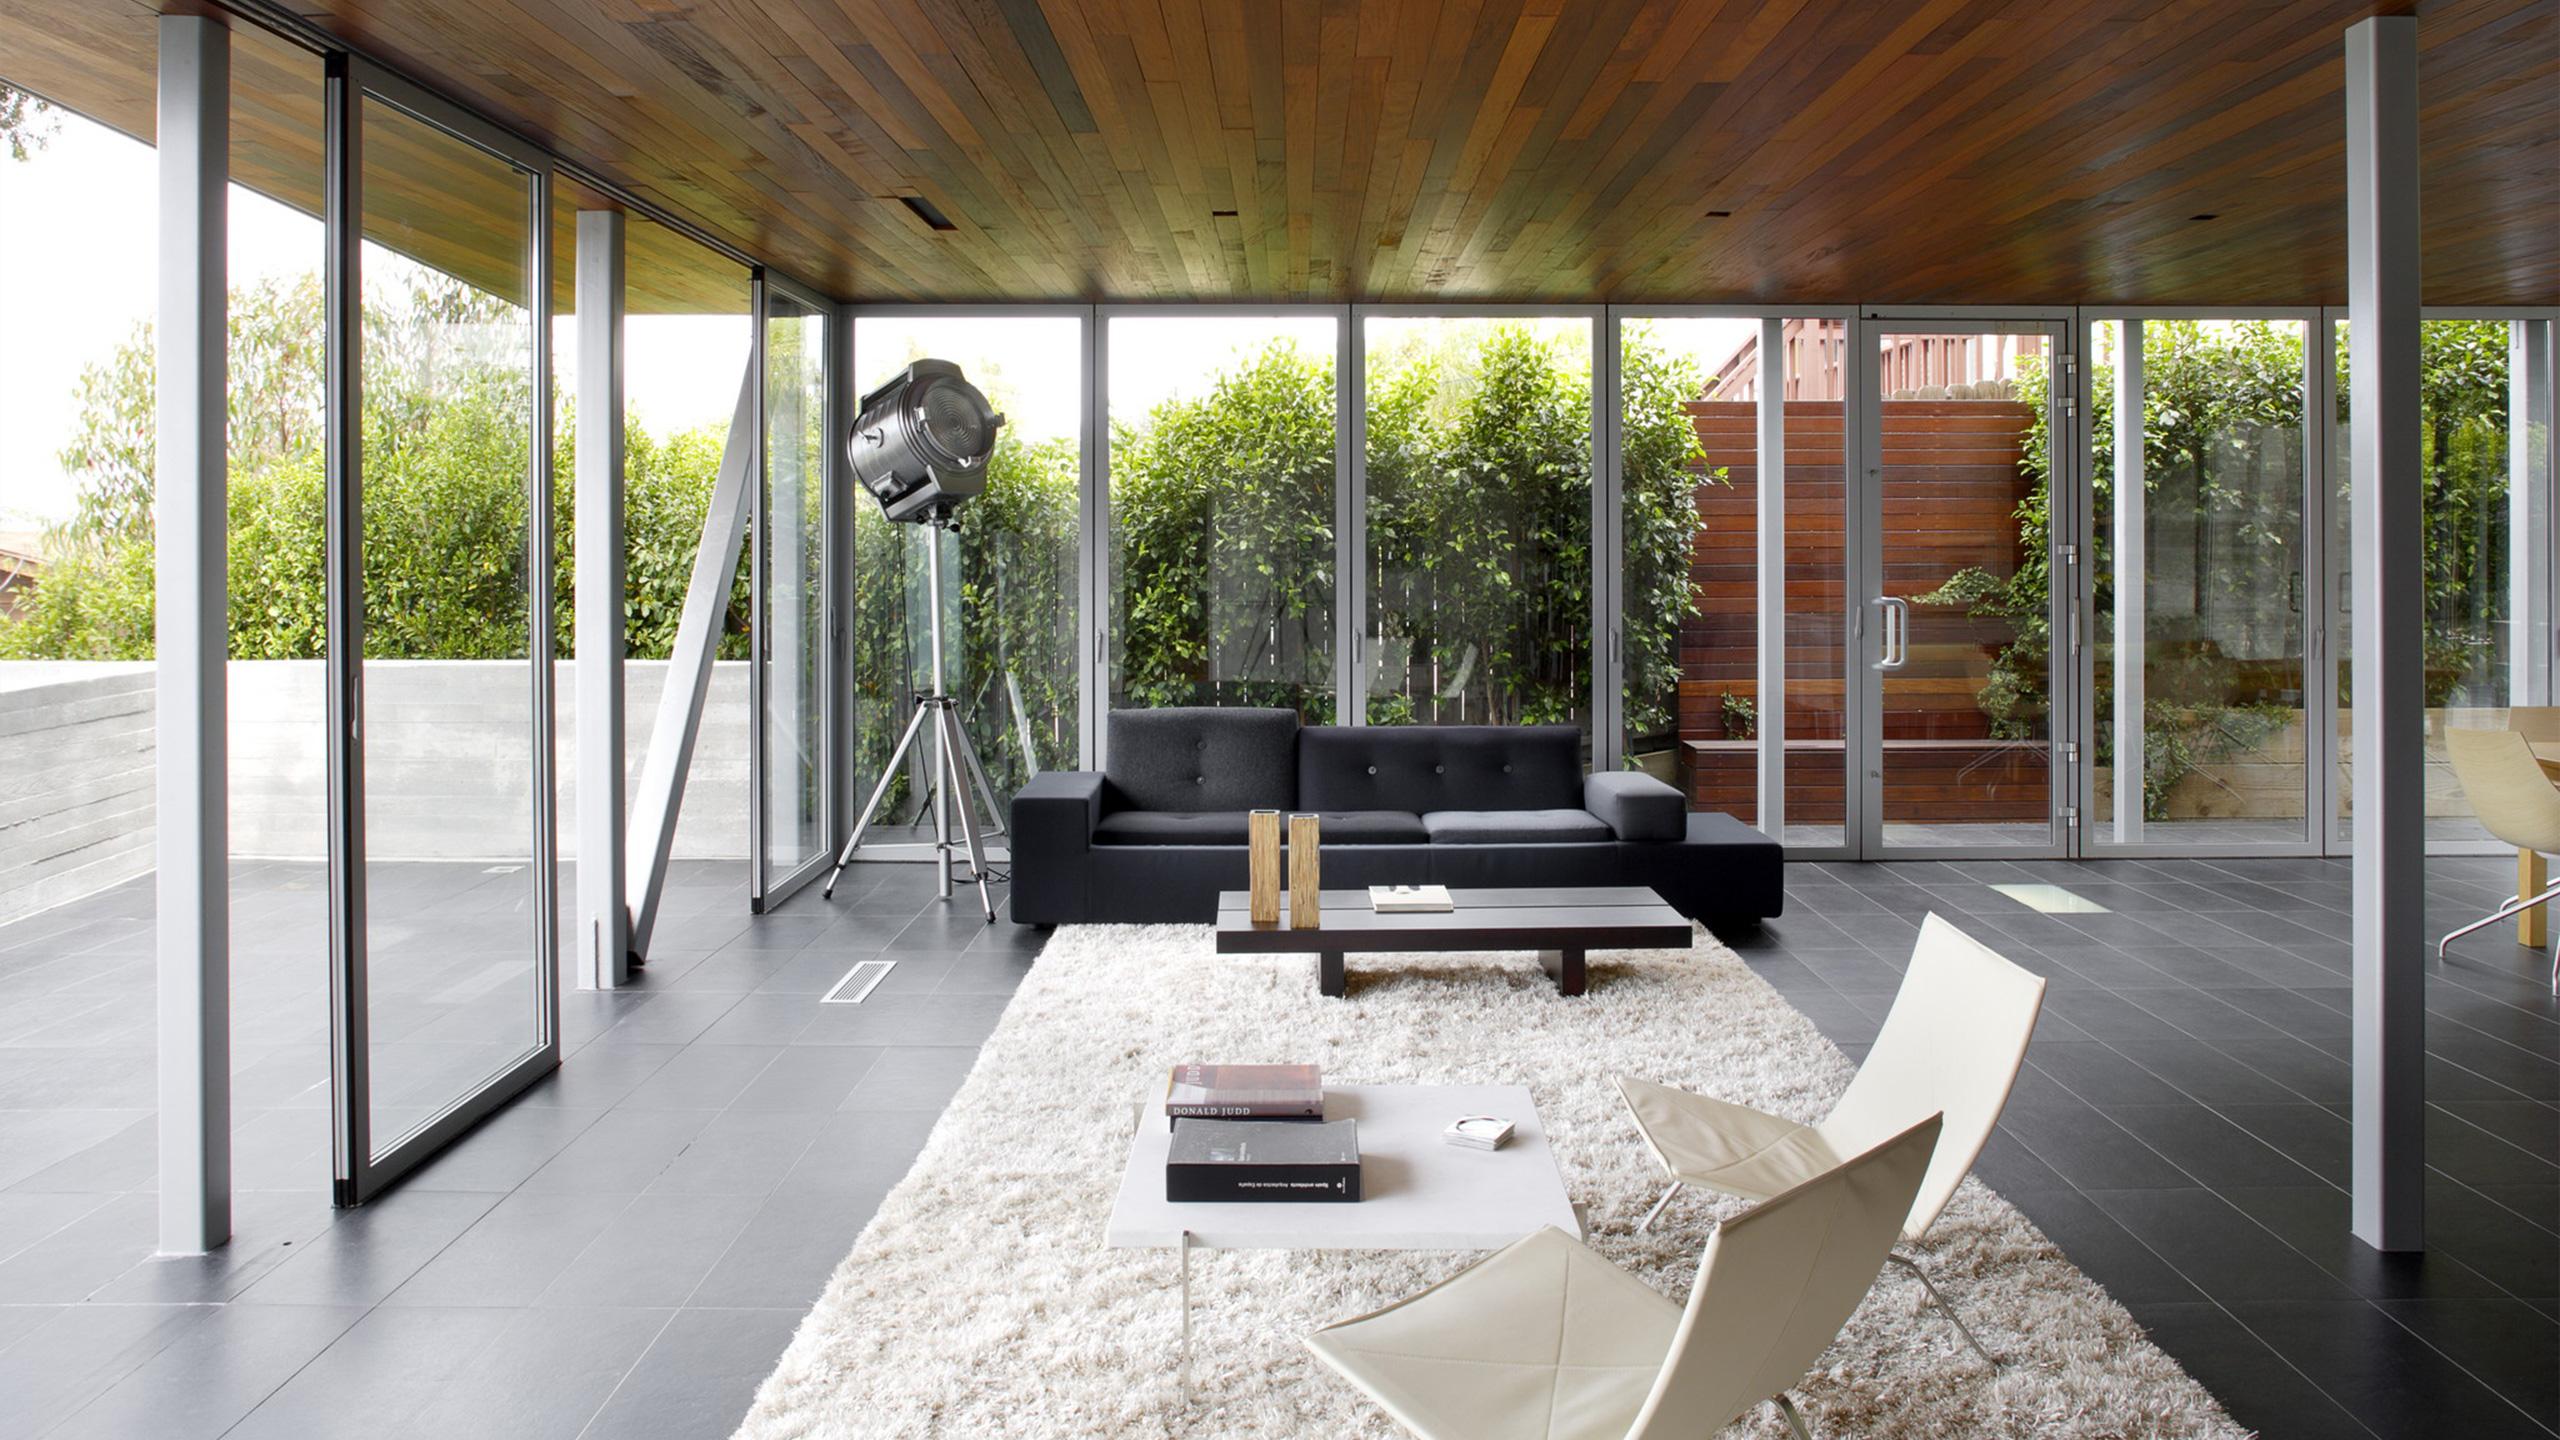 NanaWall Photo of Interior of a La Jolla Home